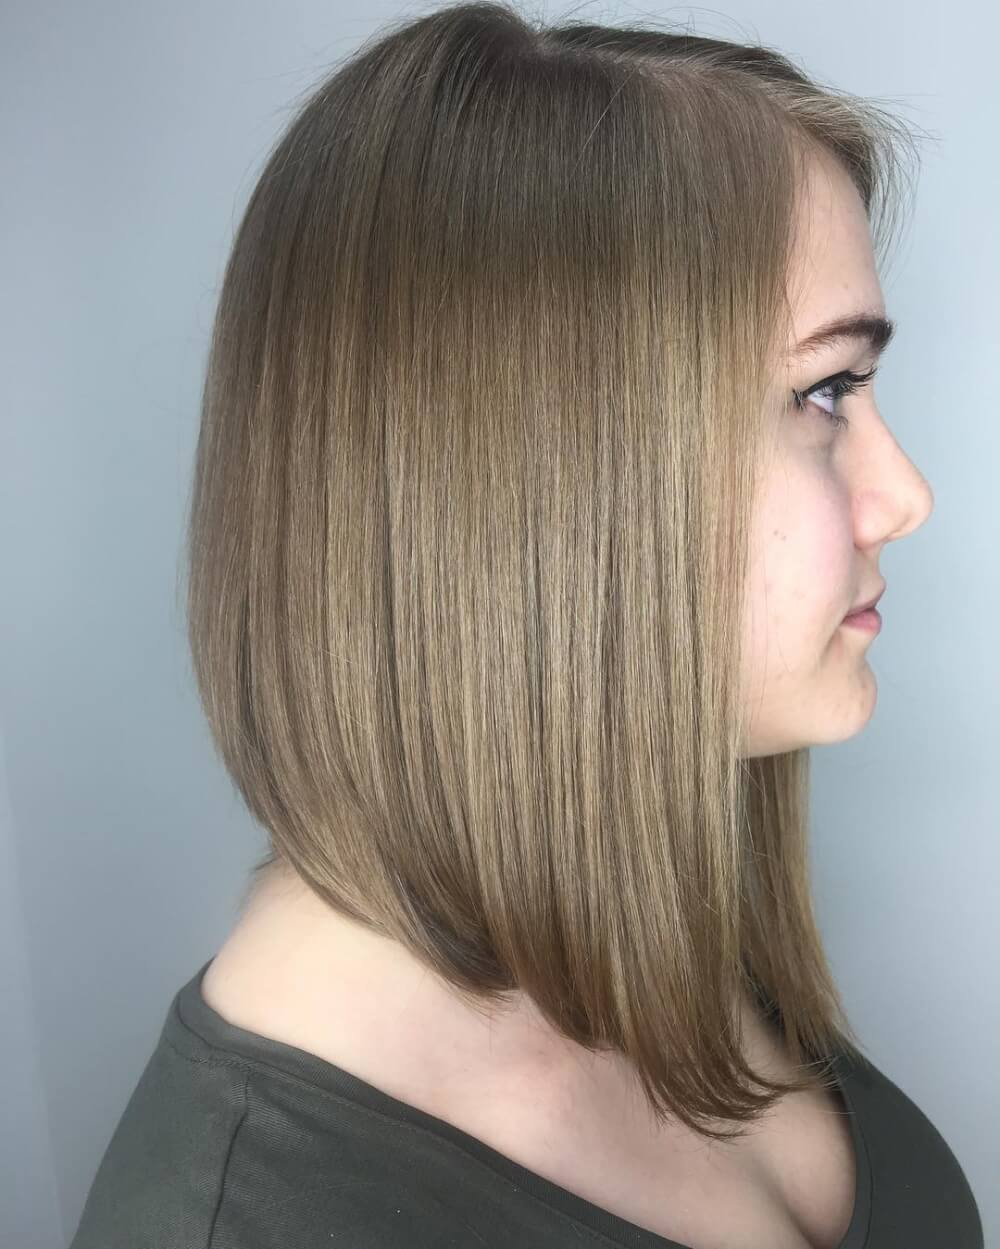 Versatile shoulder-length angled bob haircut